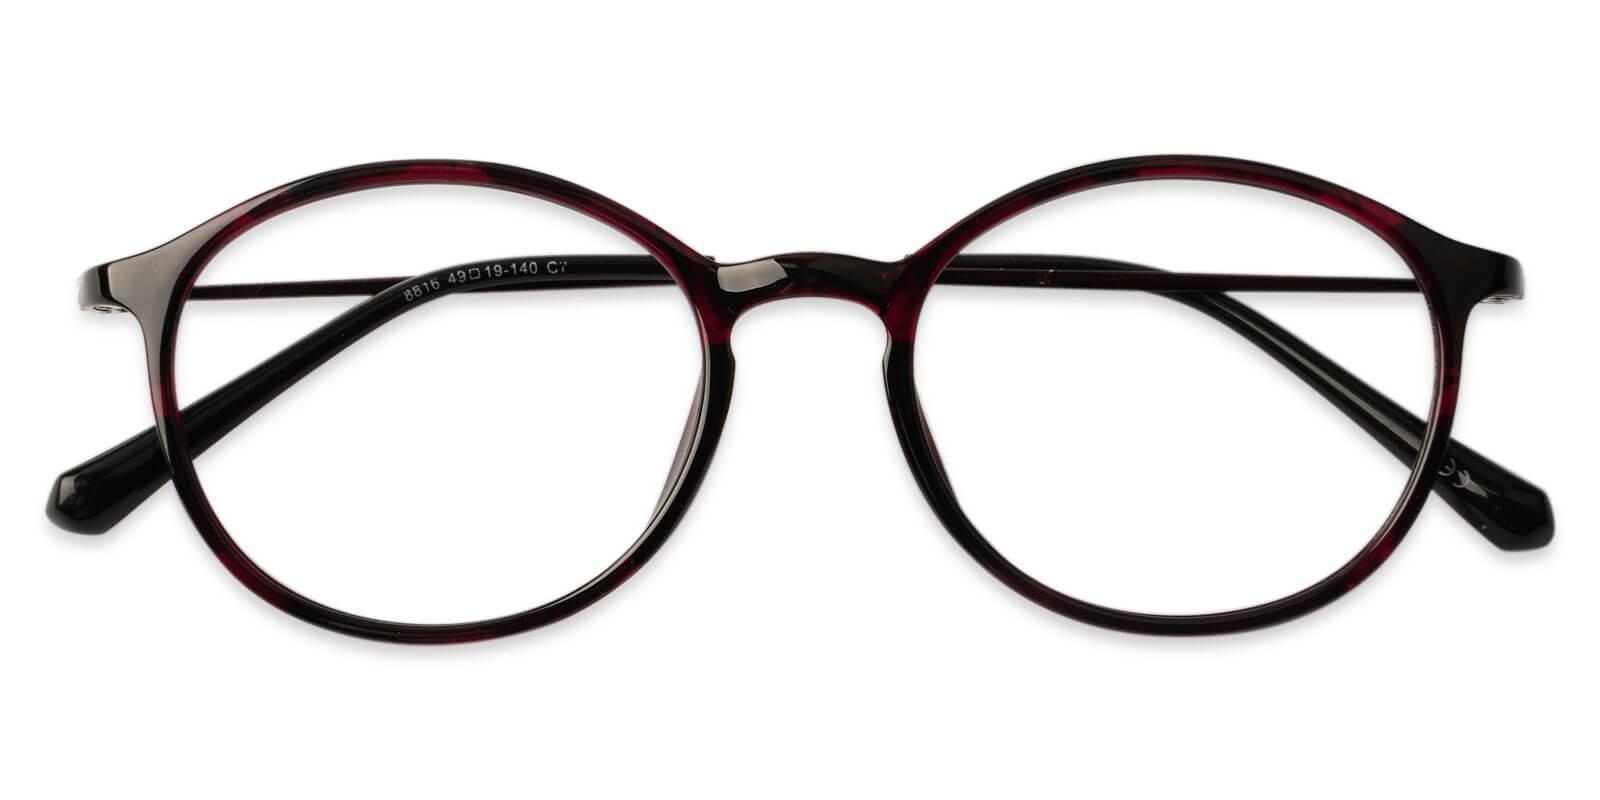 Adela Pattern Combination Eyeglasses , Lightweight , UniversalBridgeFit Frames from ABBE Glasses